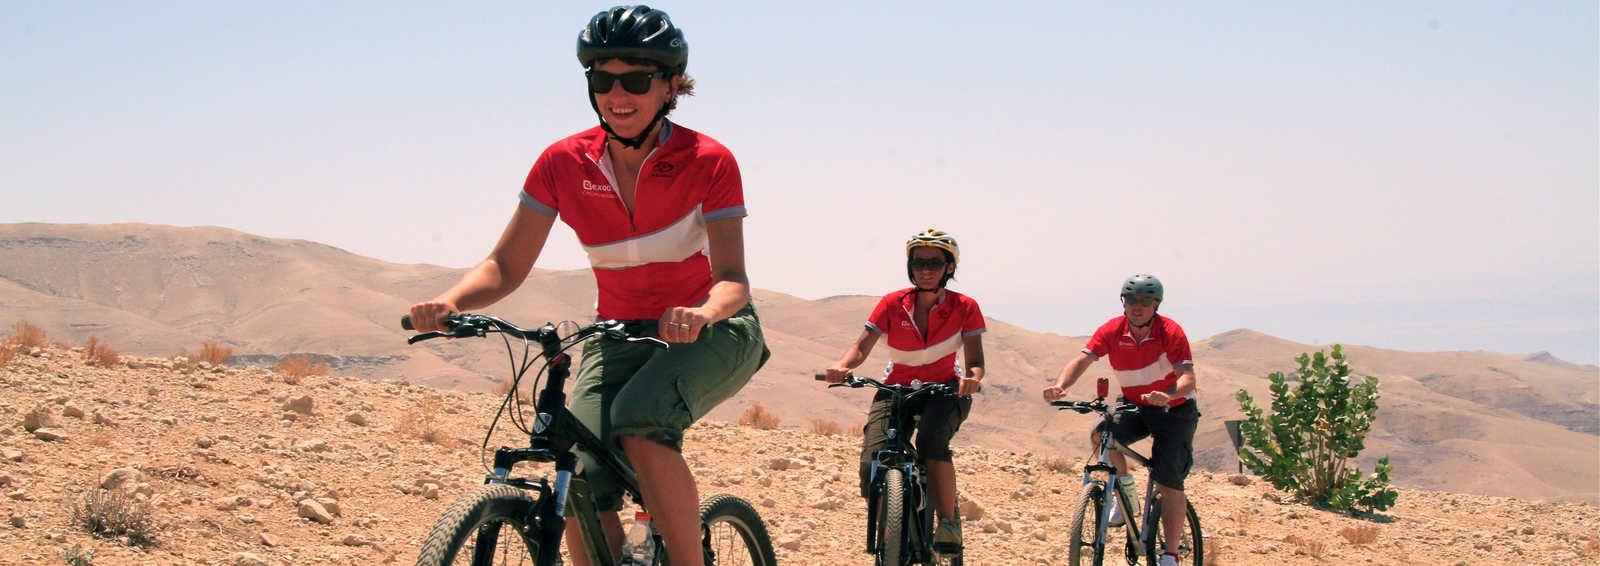 Mountain biking in Jordan